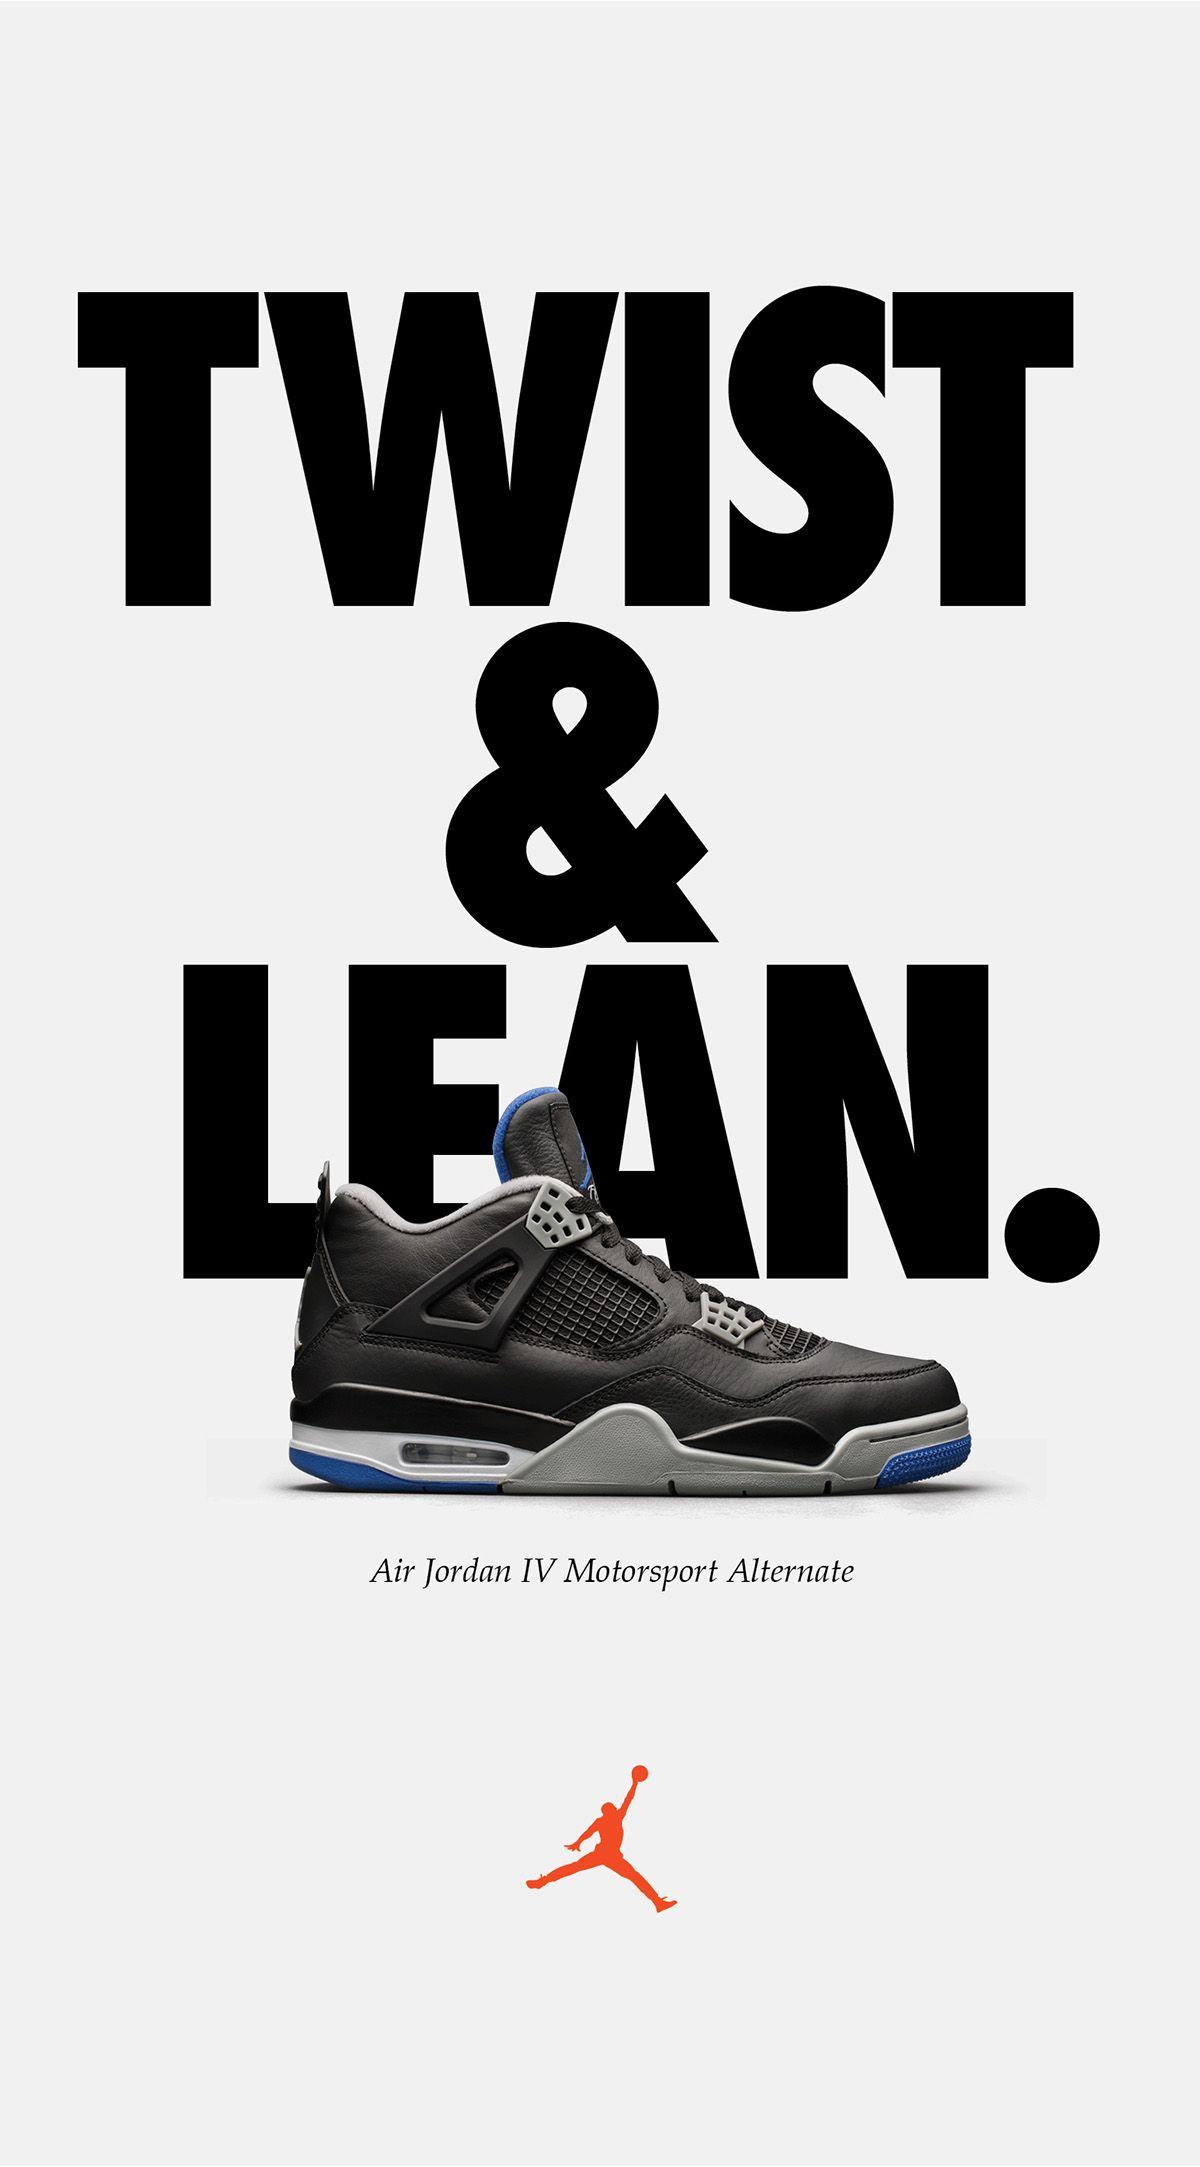 ba93f0c1a81e Preview  Air Jordan 4 Retro  Alternate Motorsport  - EU Kicks  Sneaker  Magazine